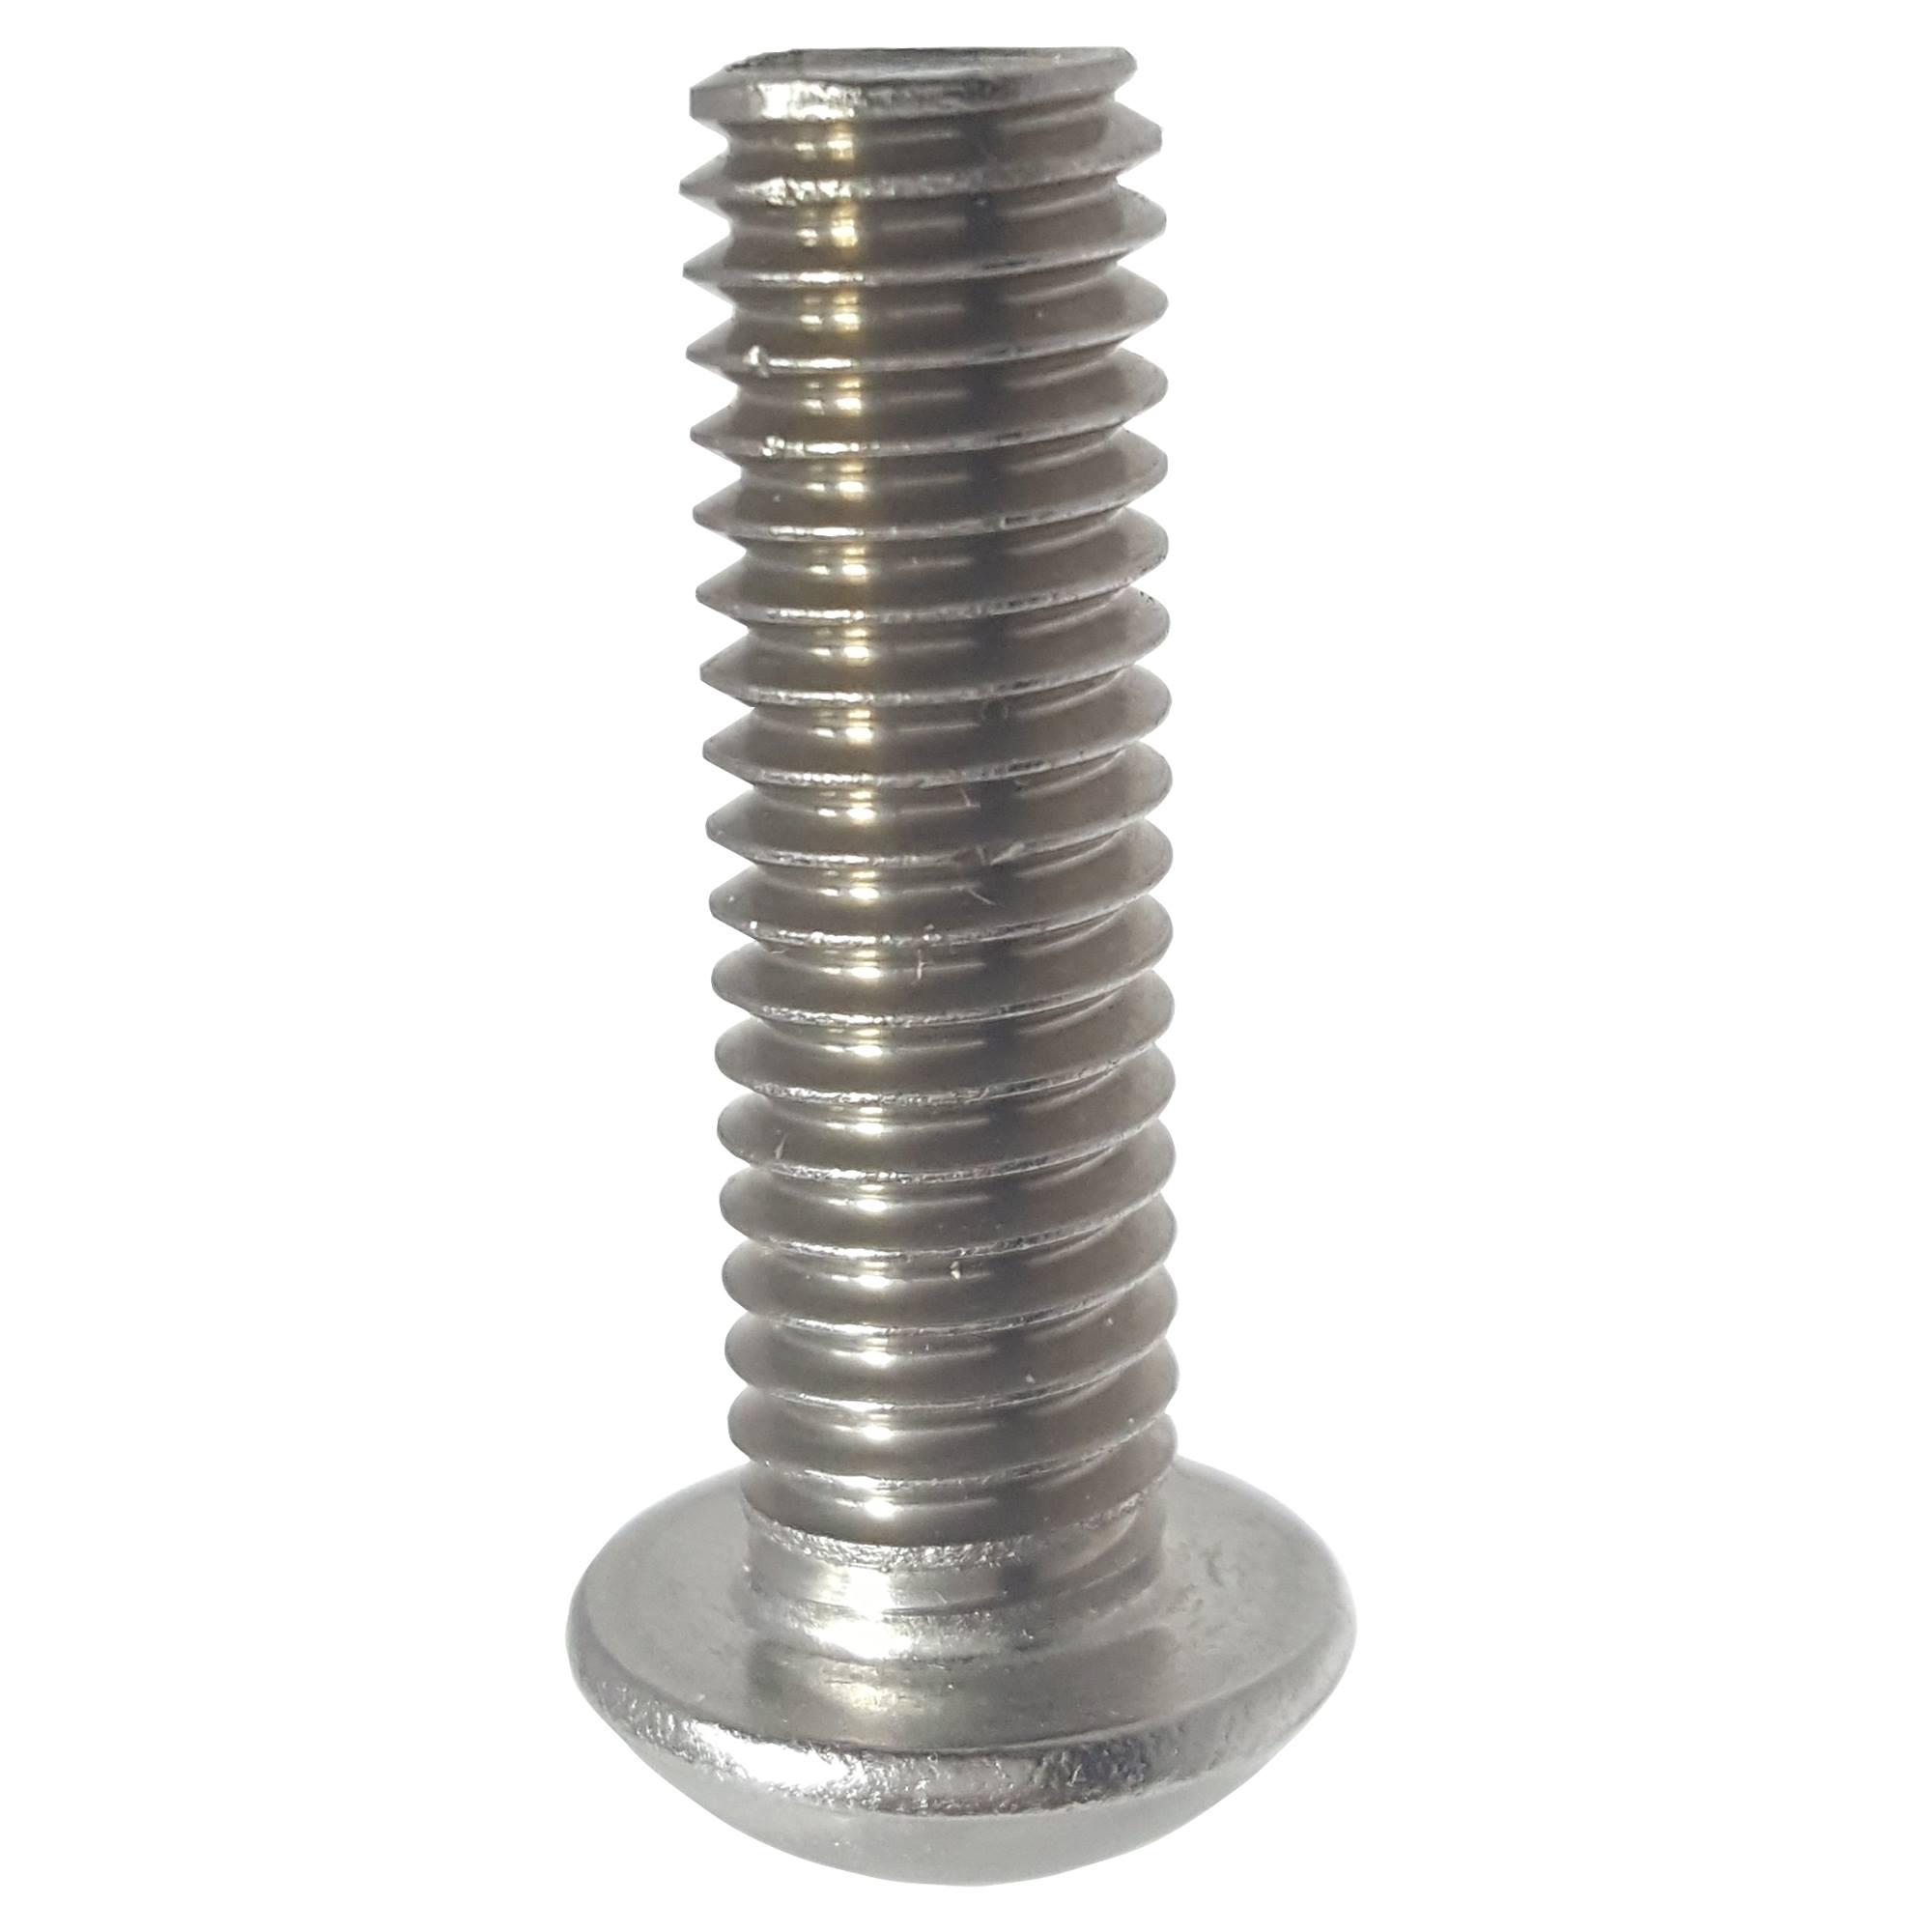 0-80 Button Head Socket Cap Screws Allen Hex Drive Stainless Steel 18-8 Qty 100